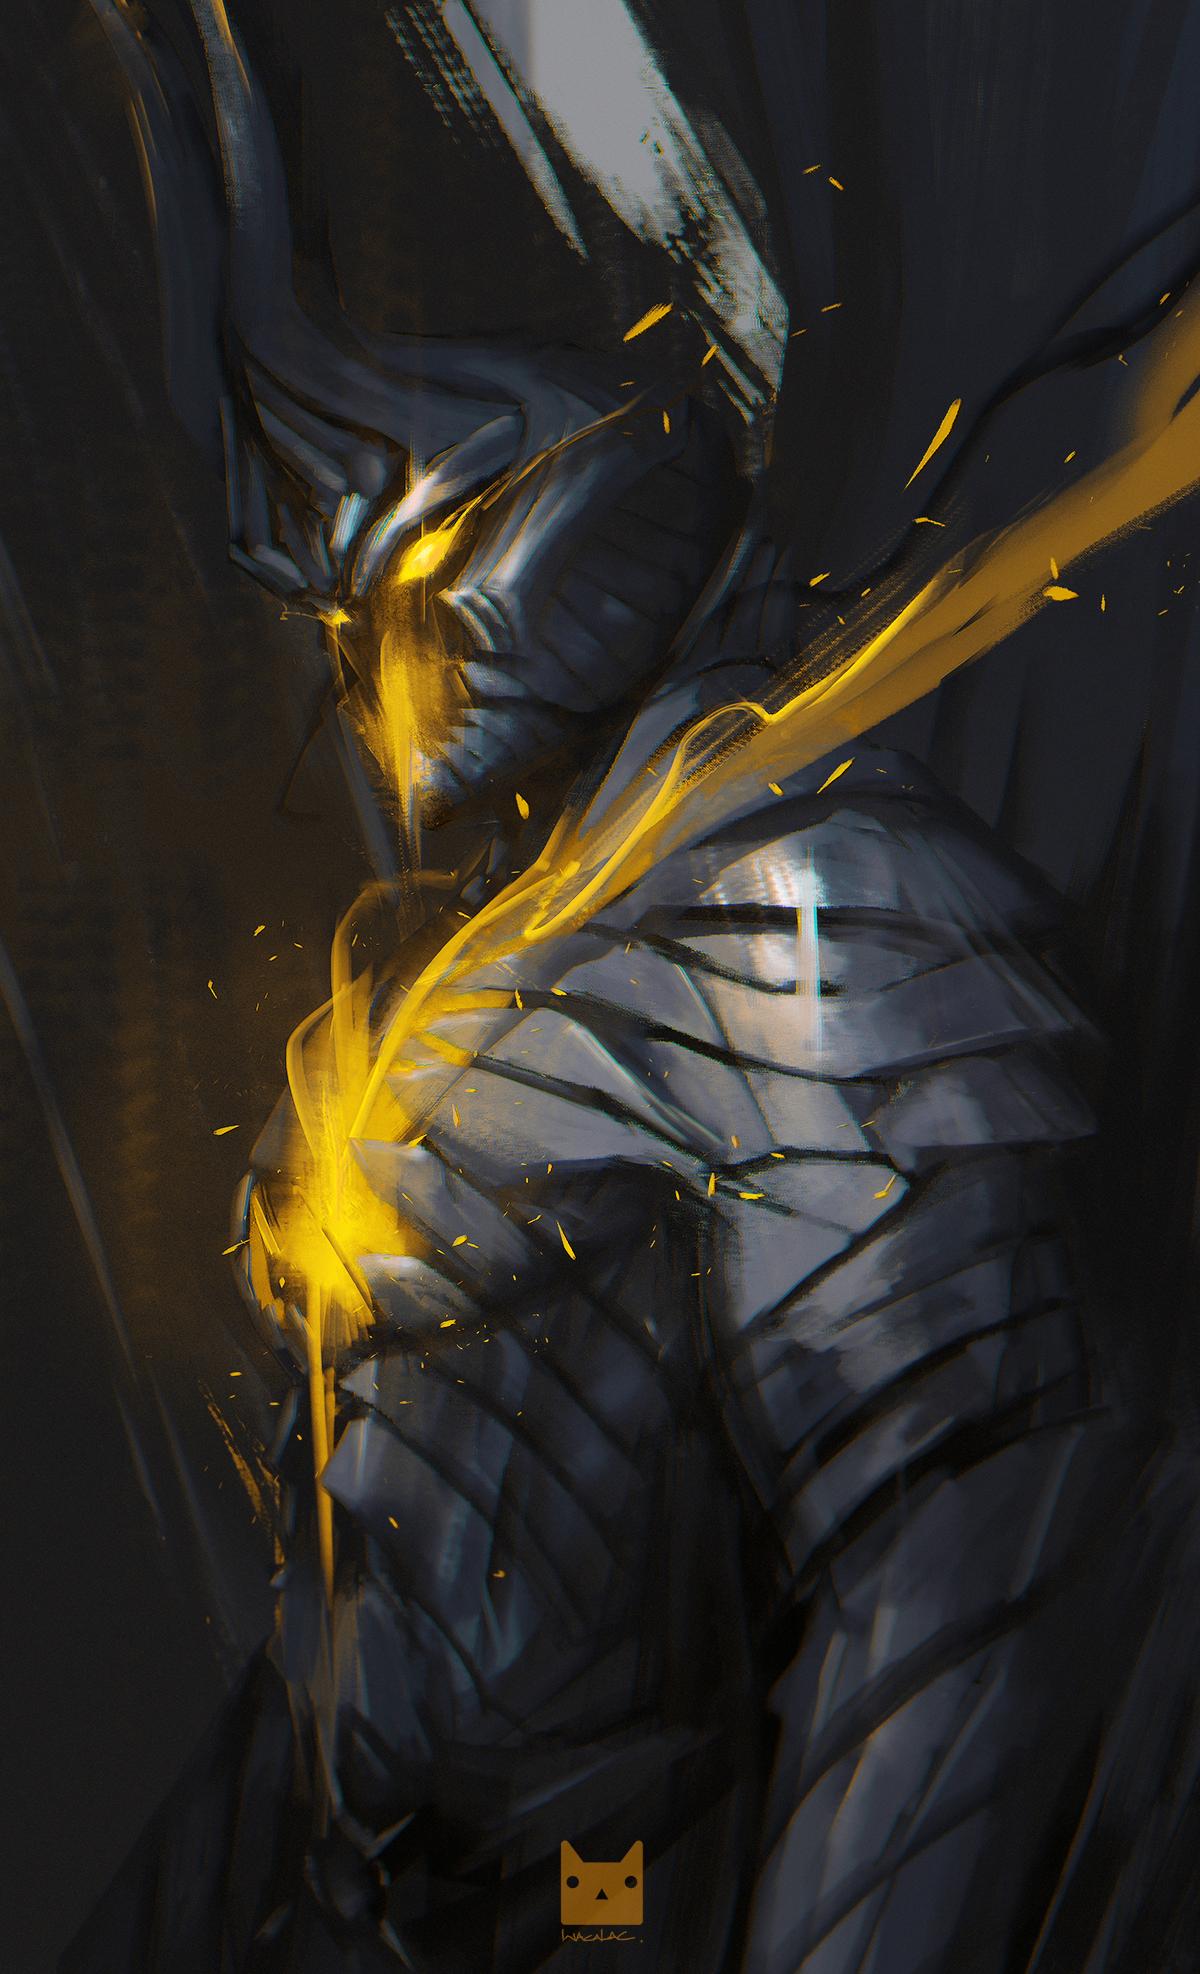 Terrorblade Arcana by wacalac on DeviantArt